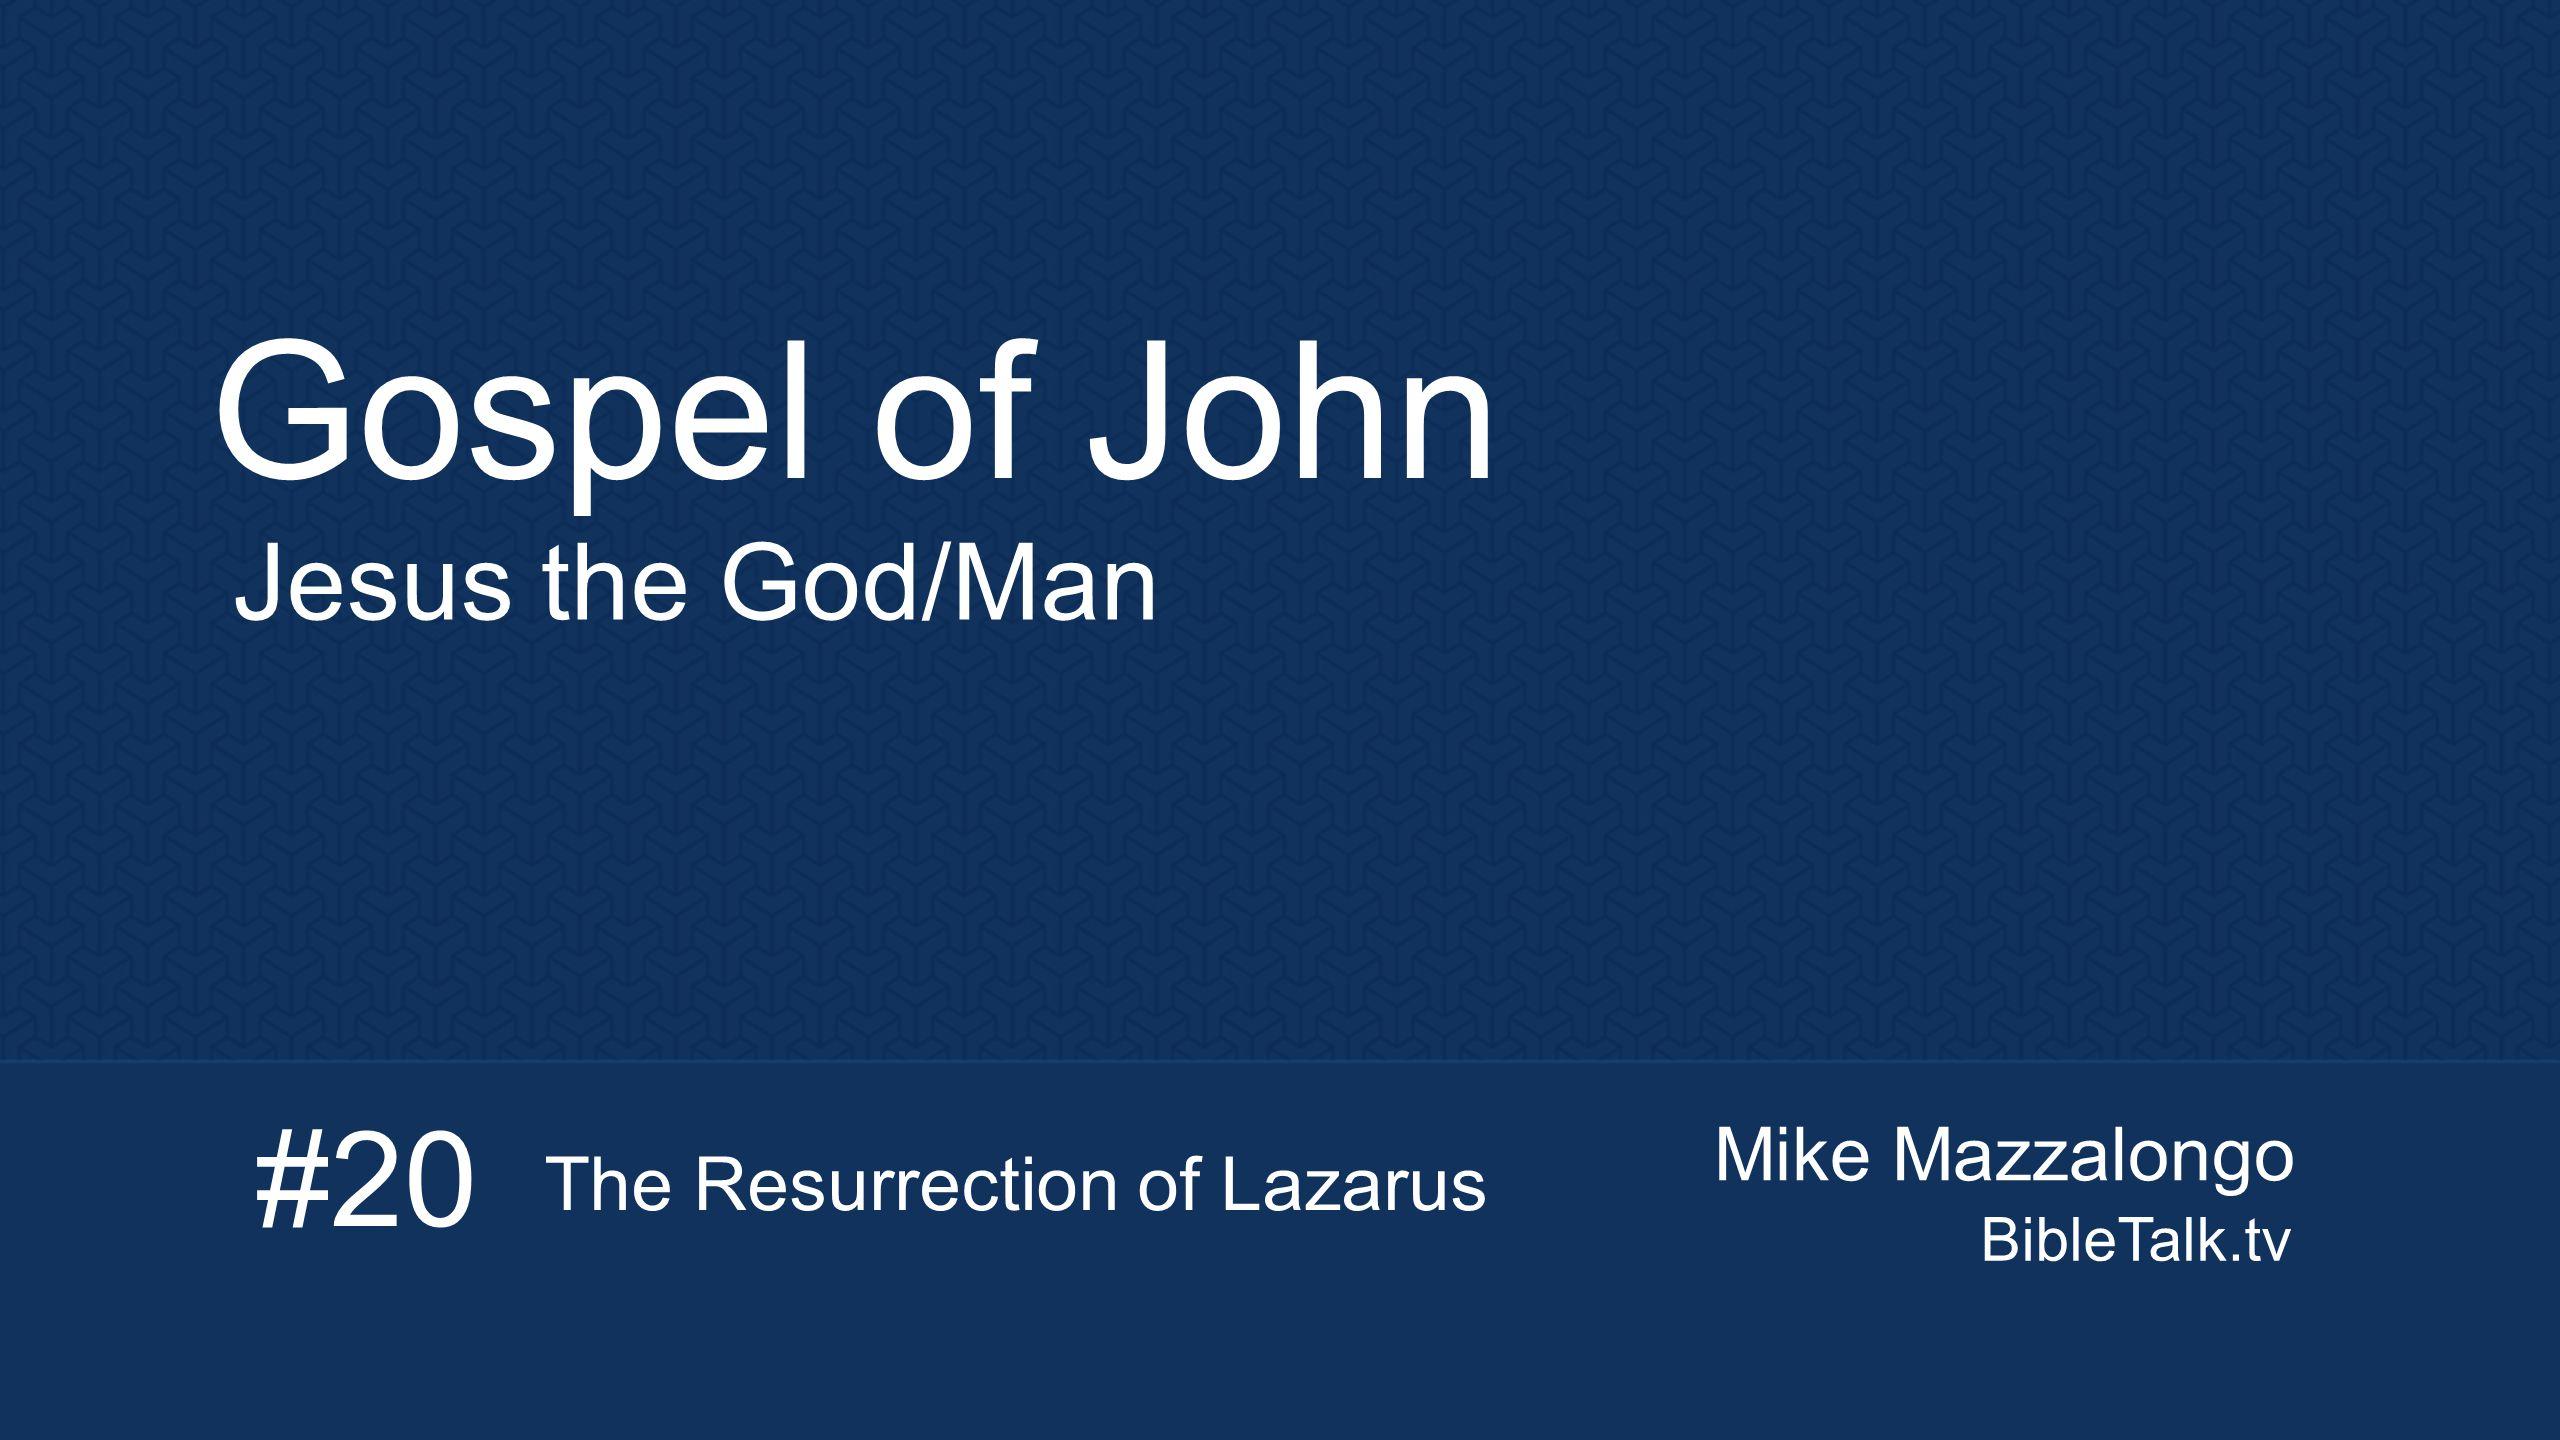 Mike Mazzalongo BibleTalk.tv Gospel of John Jesus the God/Man #20 The Resurrection of Lazarus